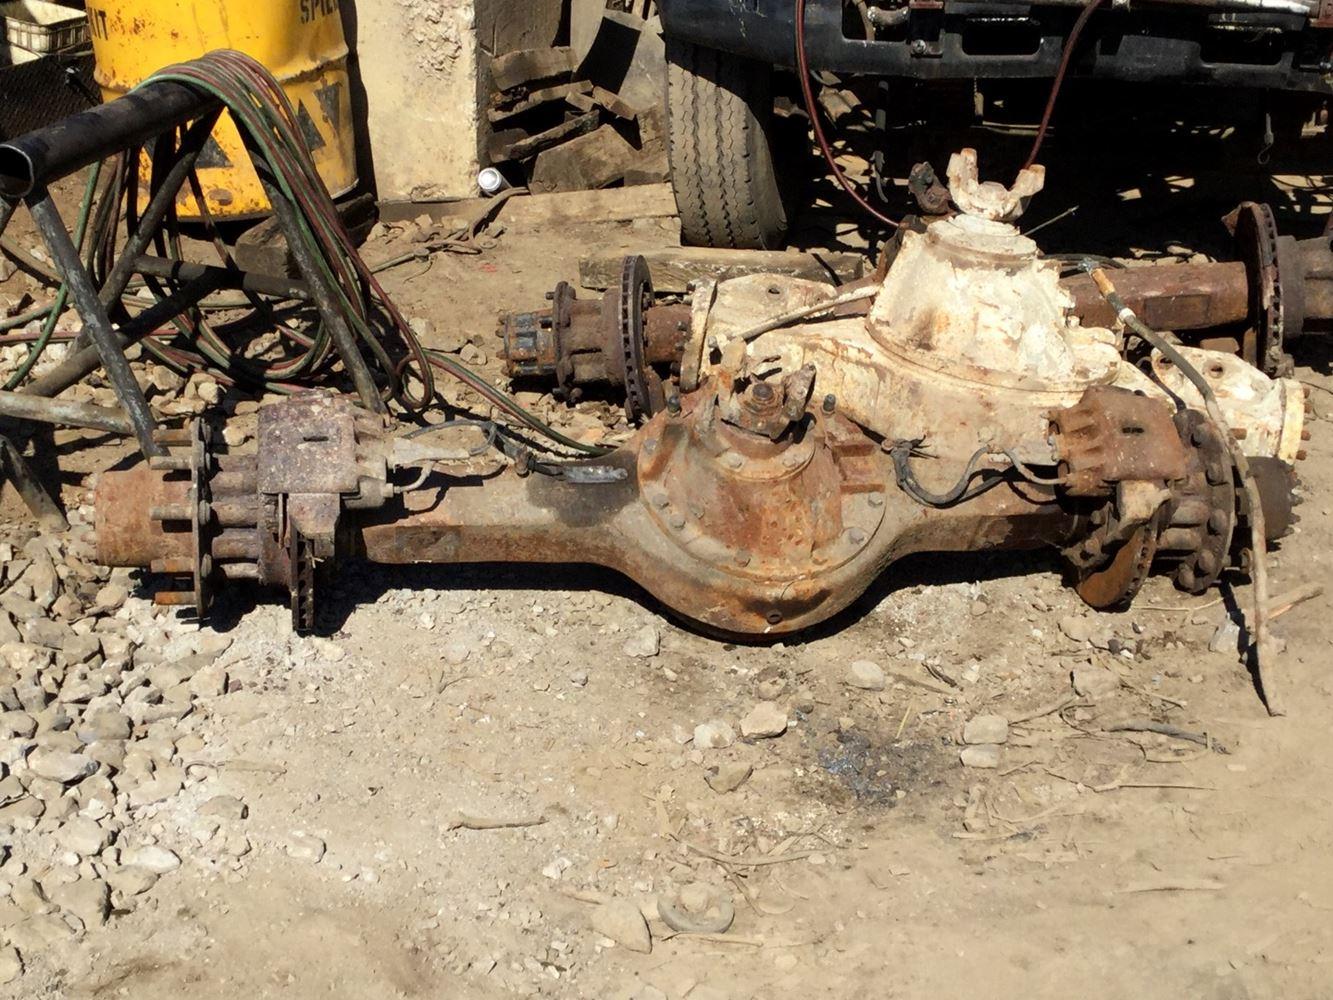 Eaton 19060S (Stock #ER-1169) | Rear Rears (Tandem Rear or